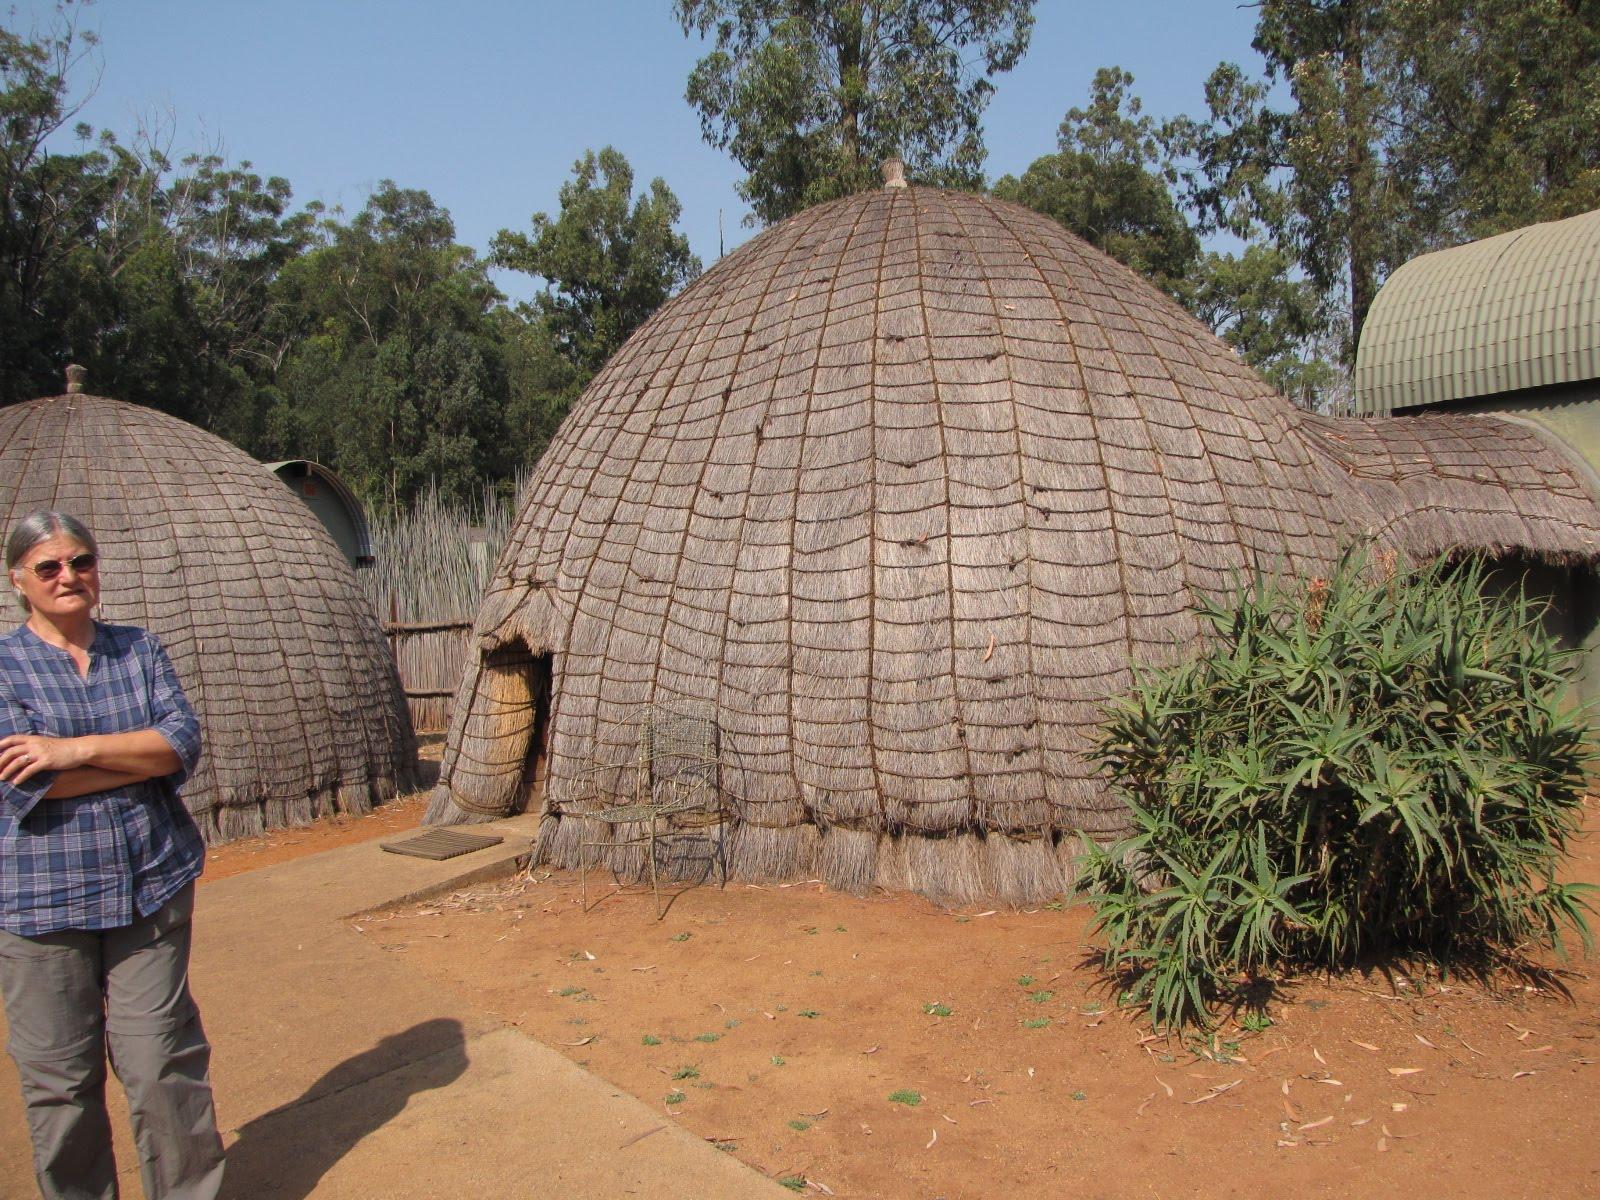 beehive village at mlilwane